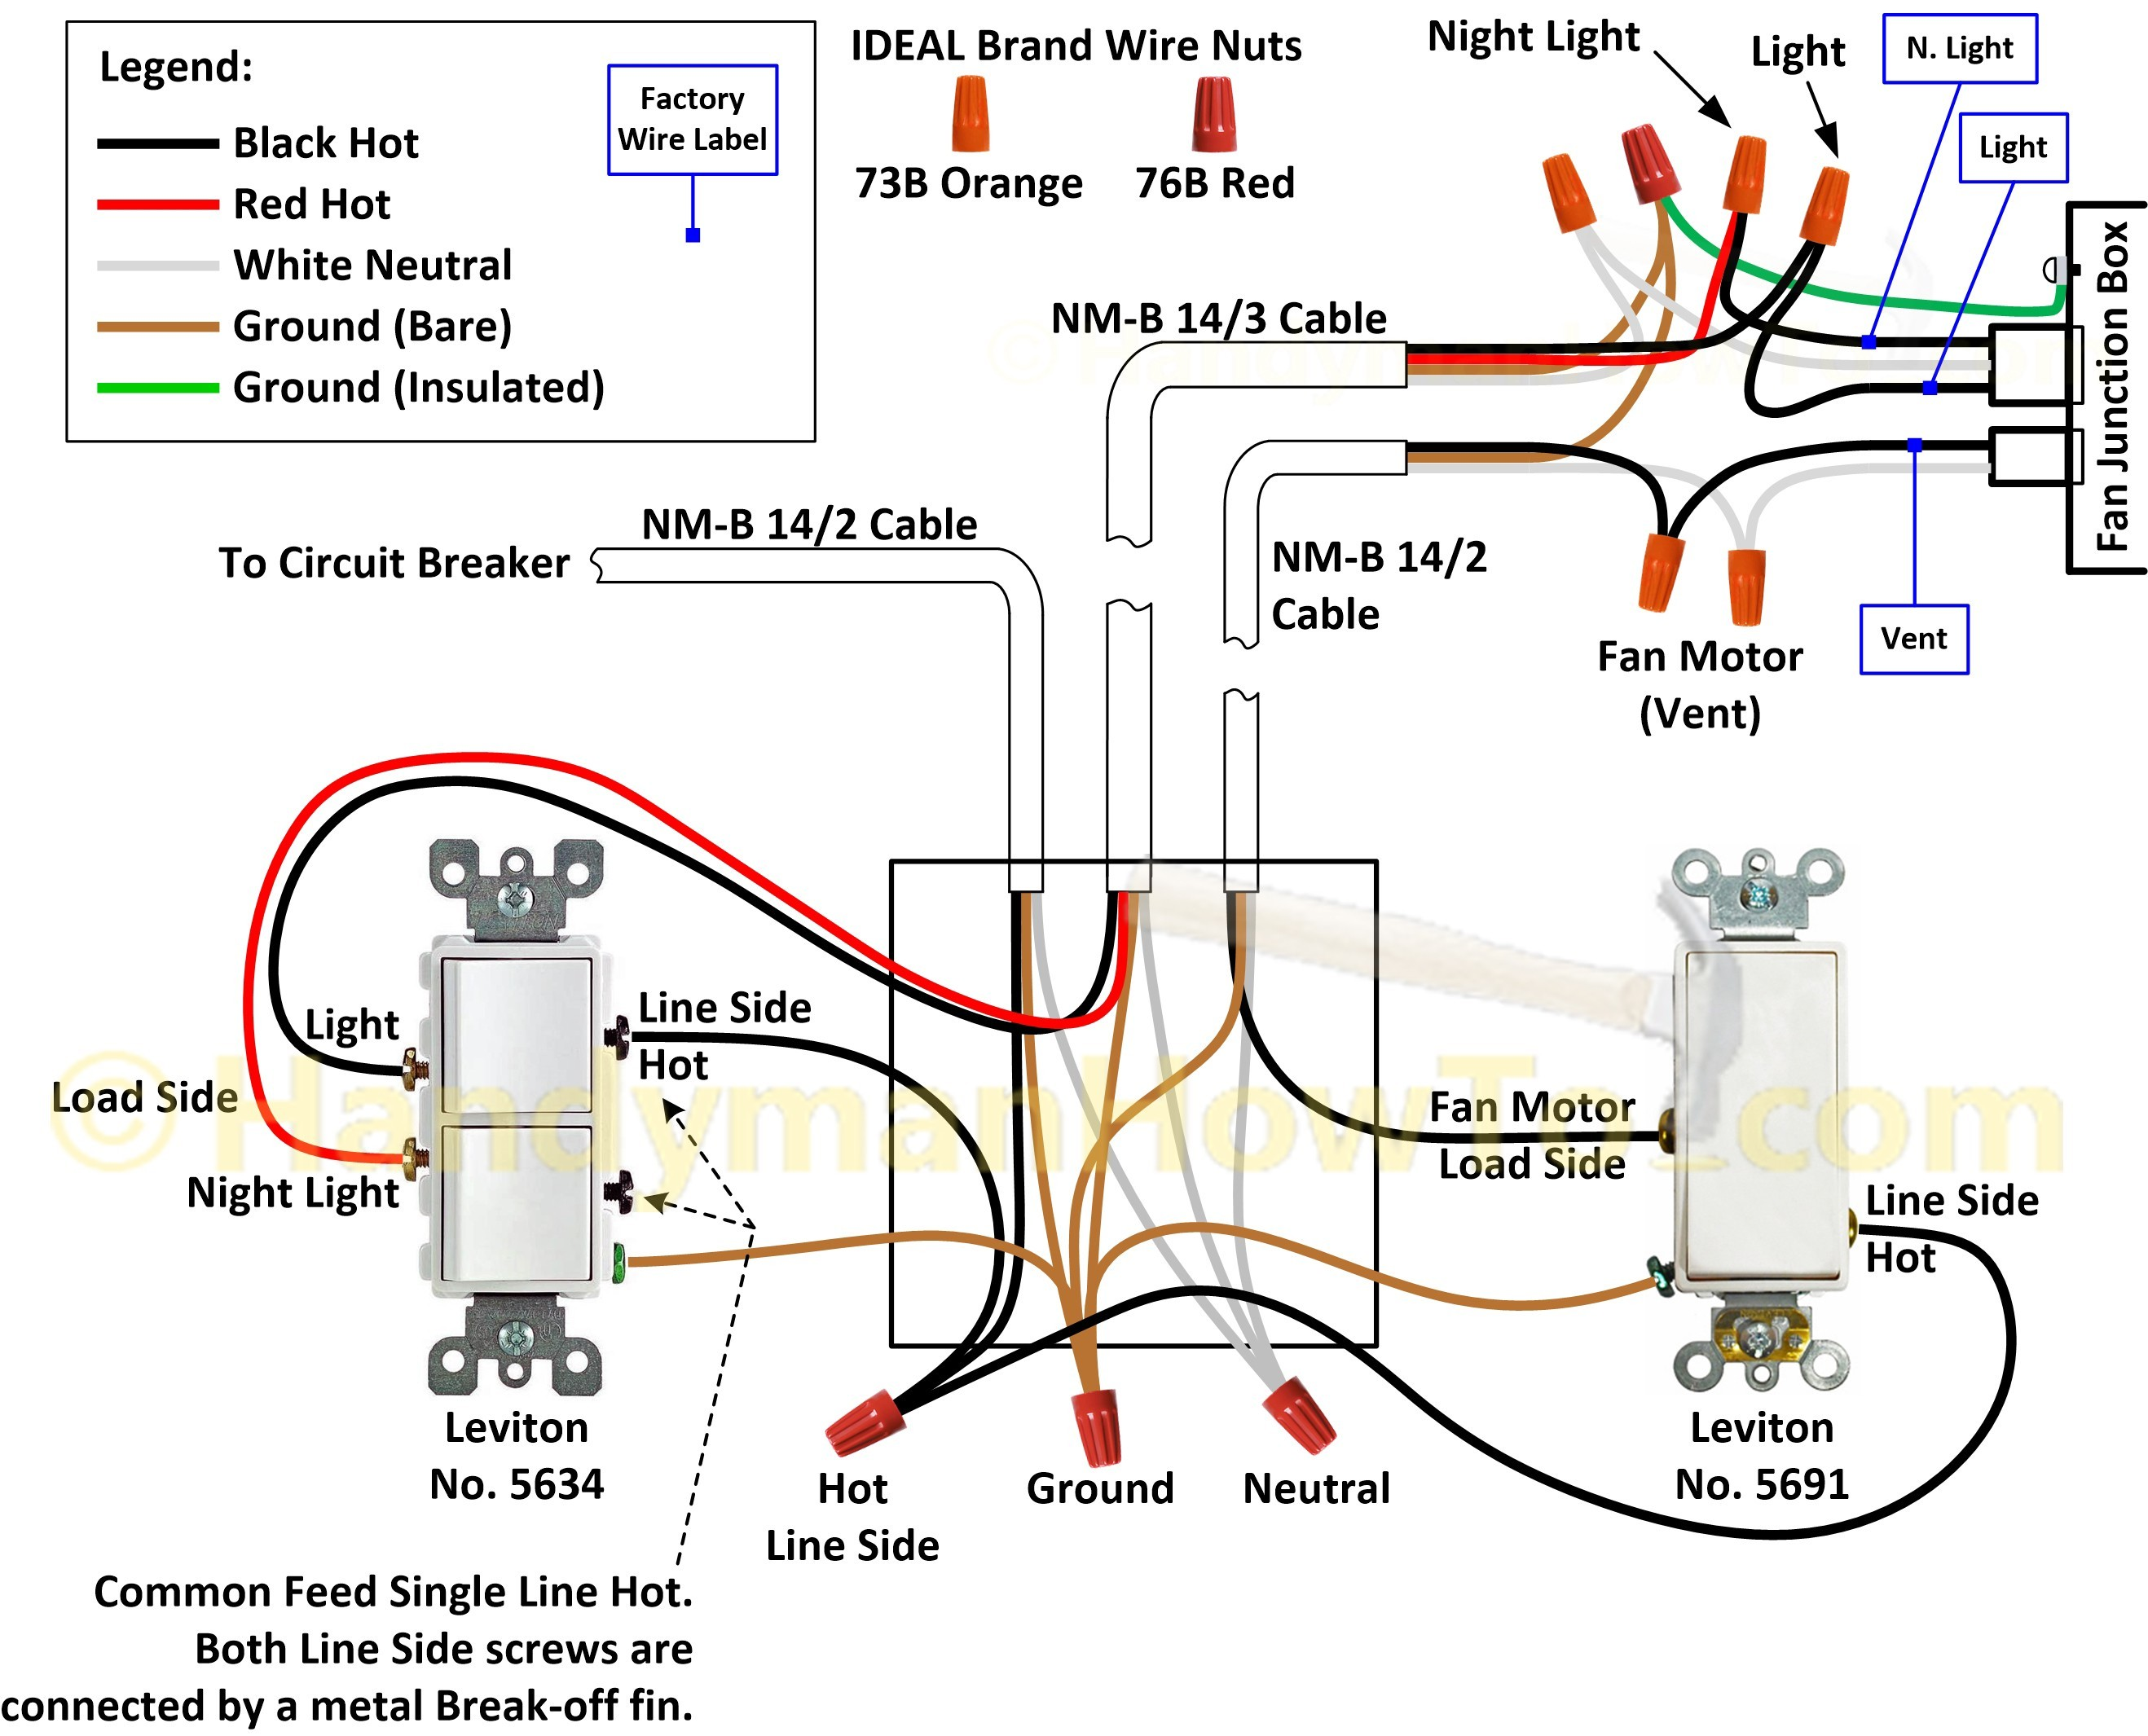 Jin You E70469 Wiring Diagram from static-cdn.imageservice.cloud